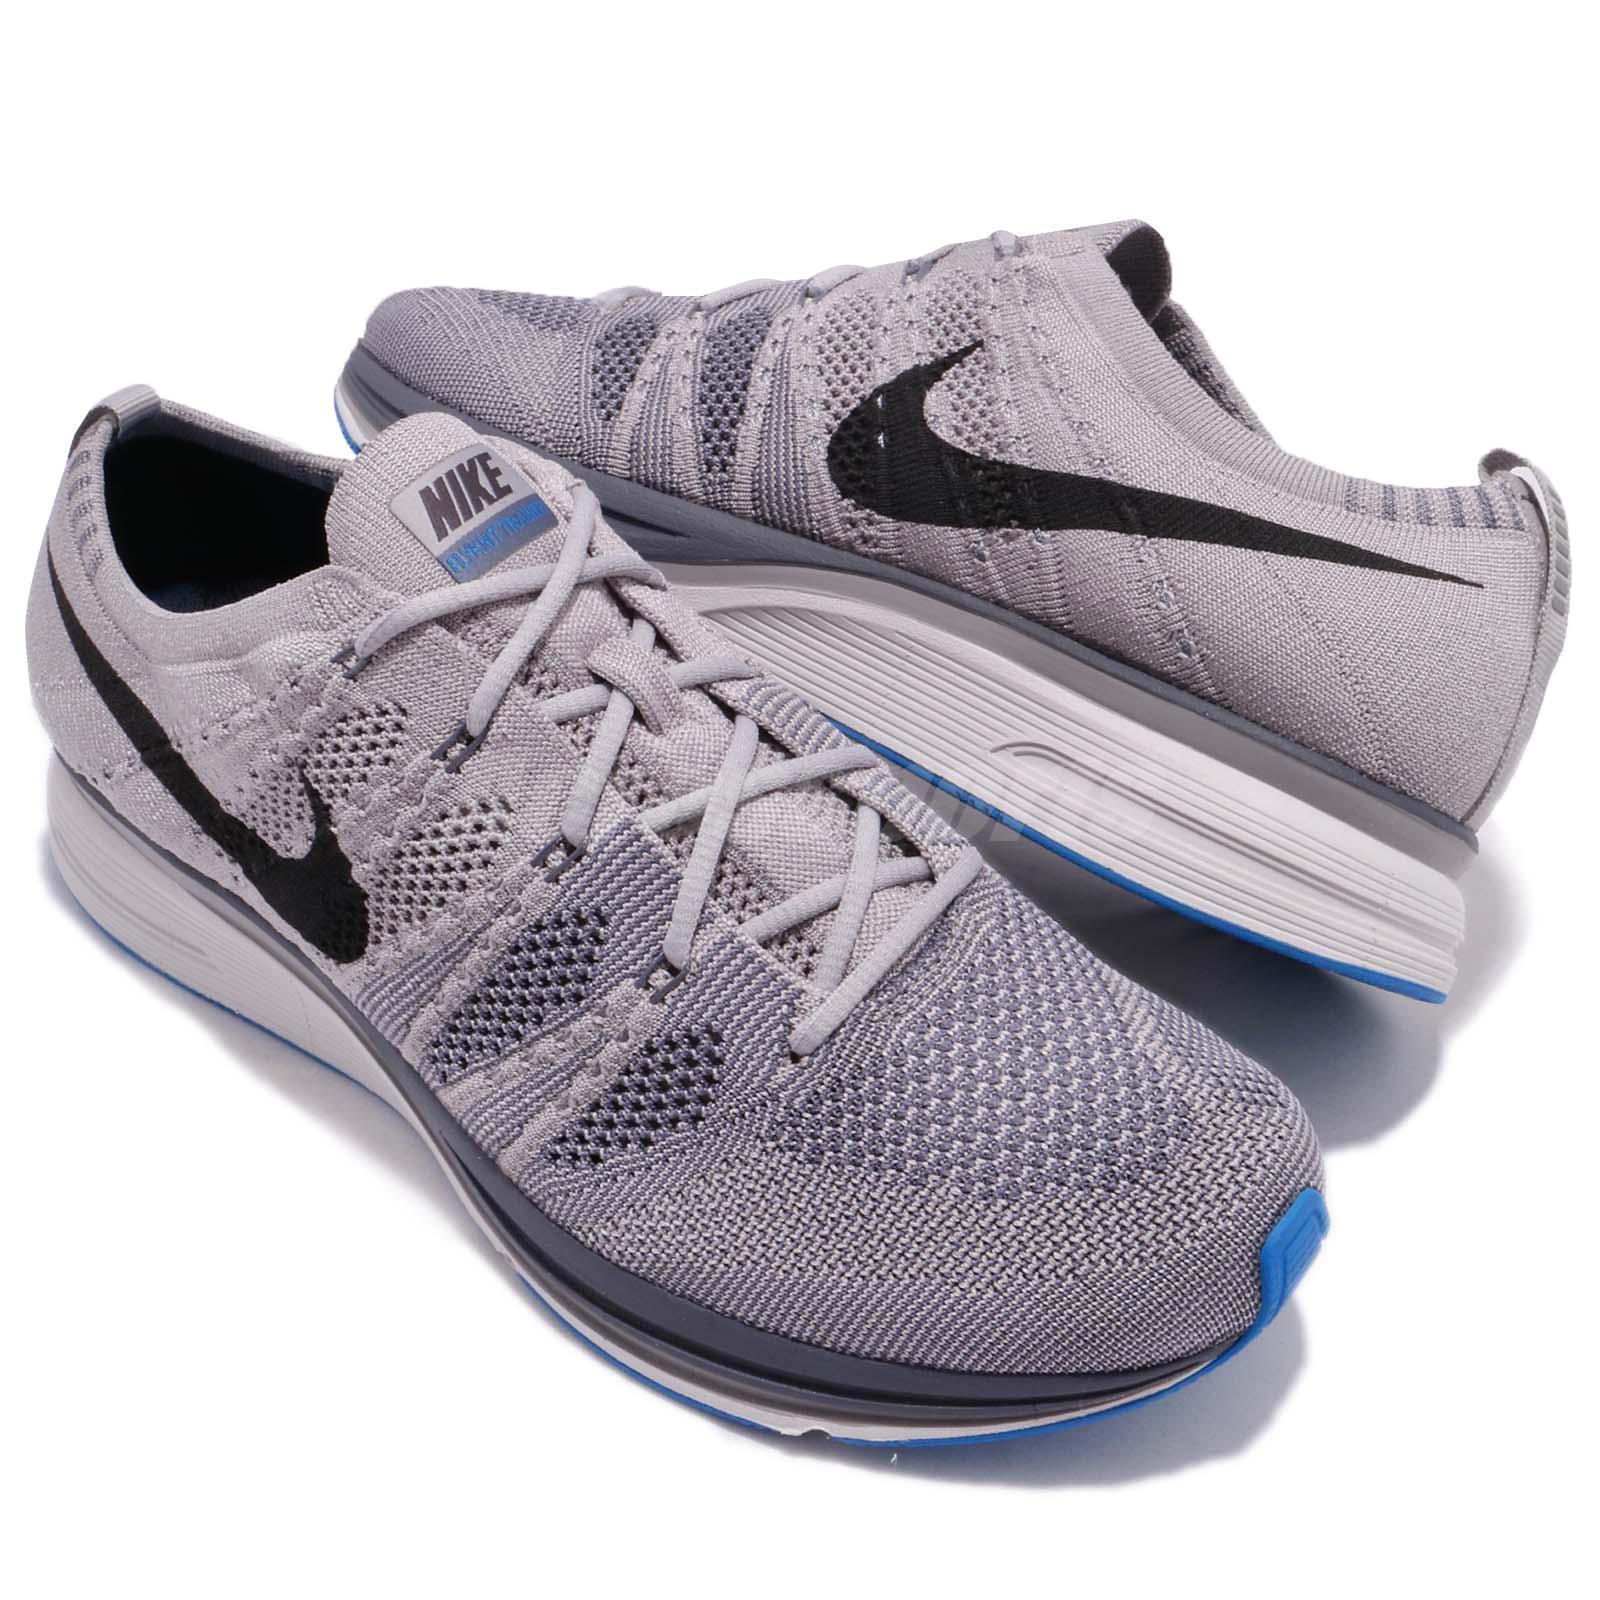 Nike - Ah8396 006 Hombres, Gris (Atmosphere Grey/Thunder Grey), 12 D(M) US